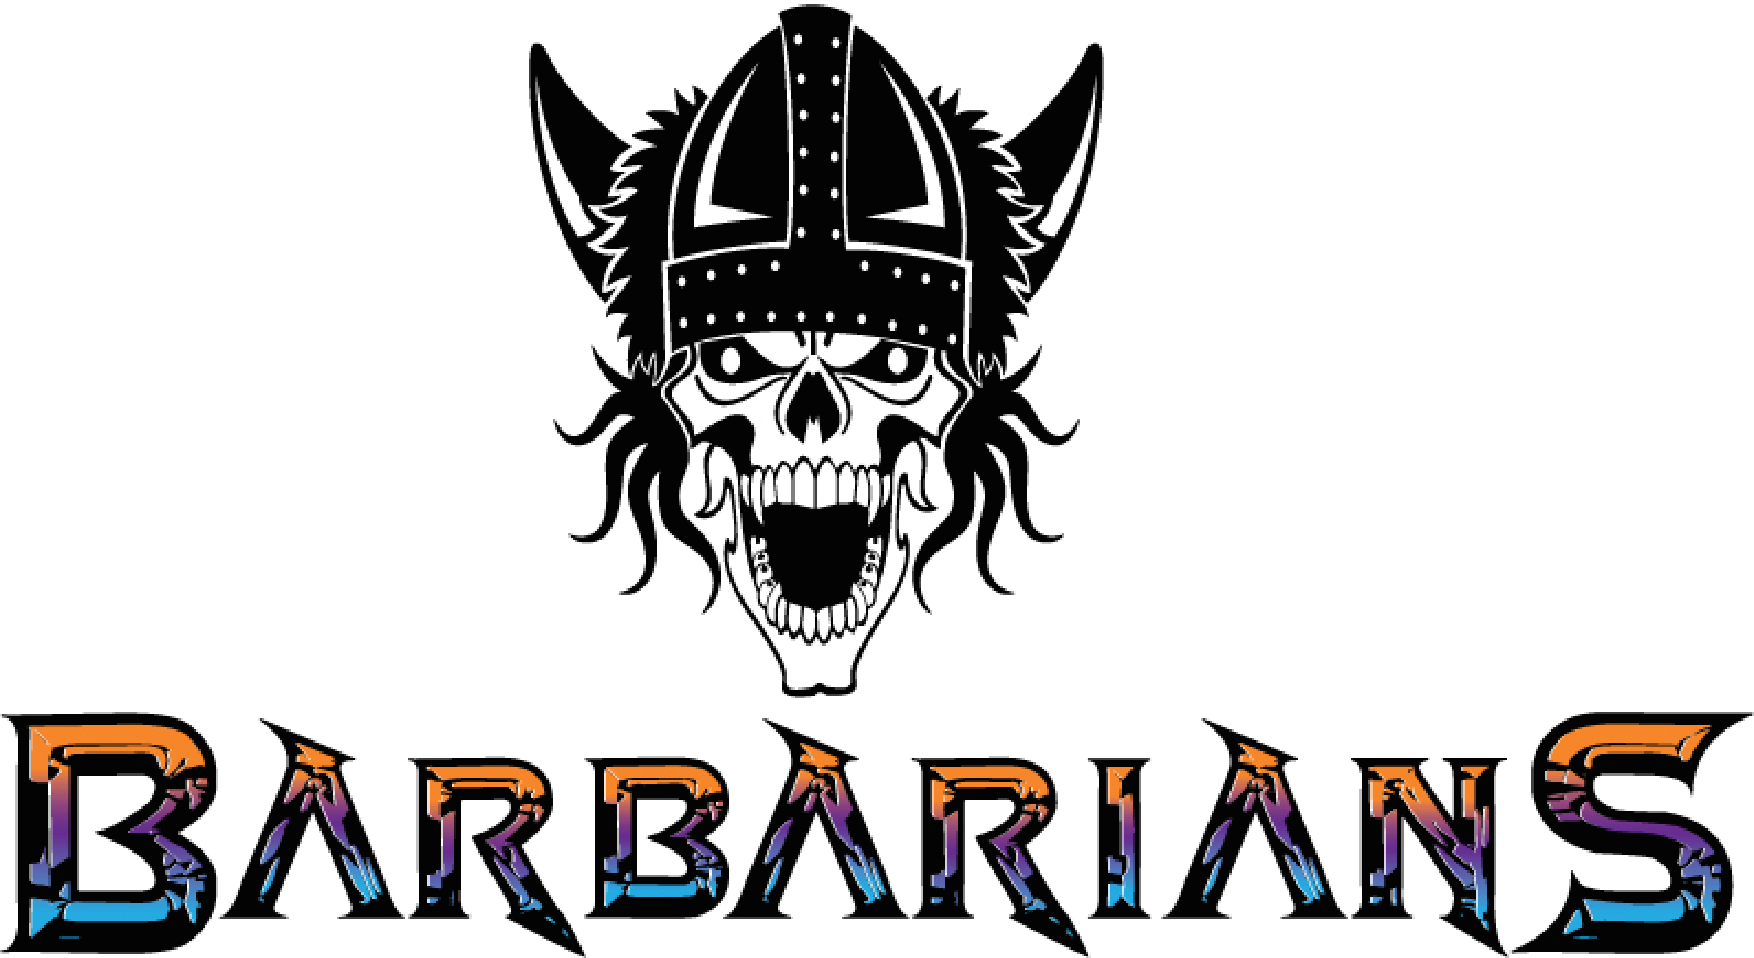 Barbarius Logo photo - 1